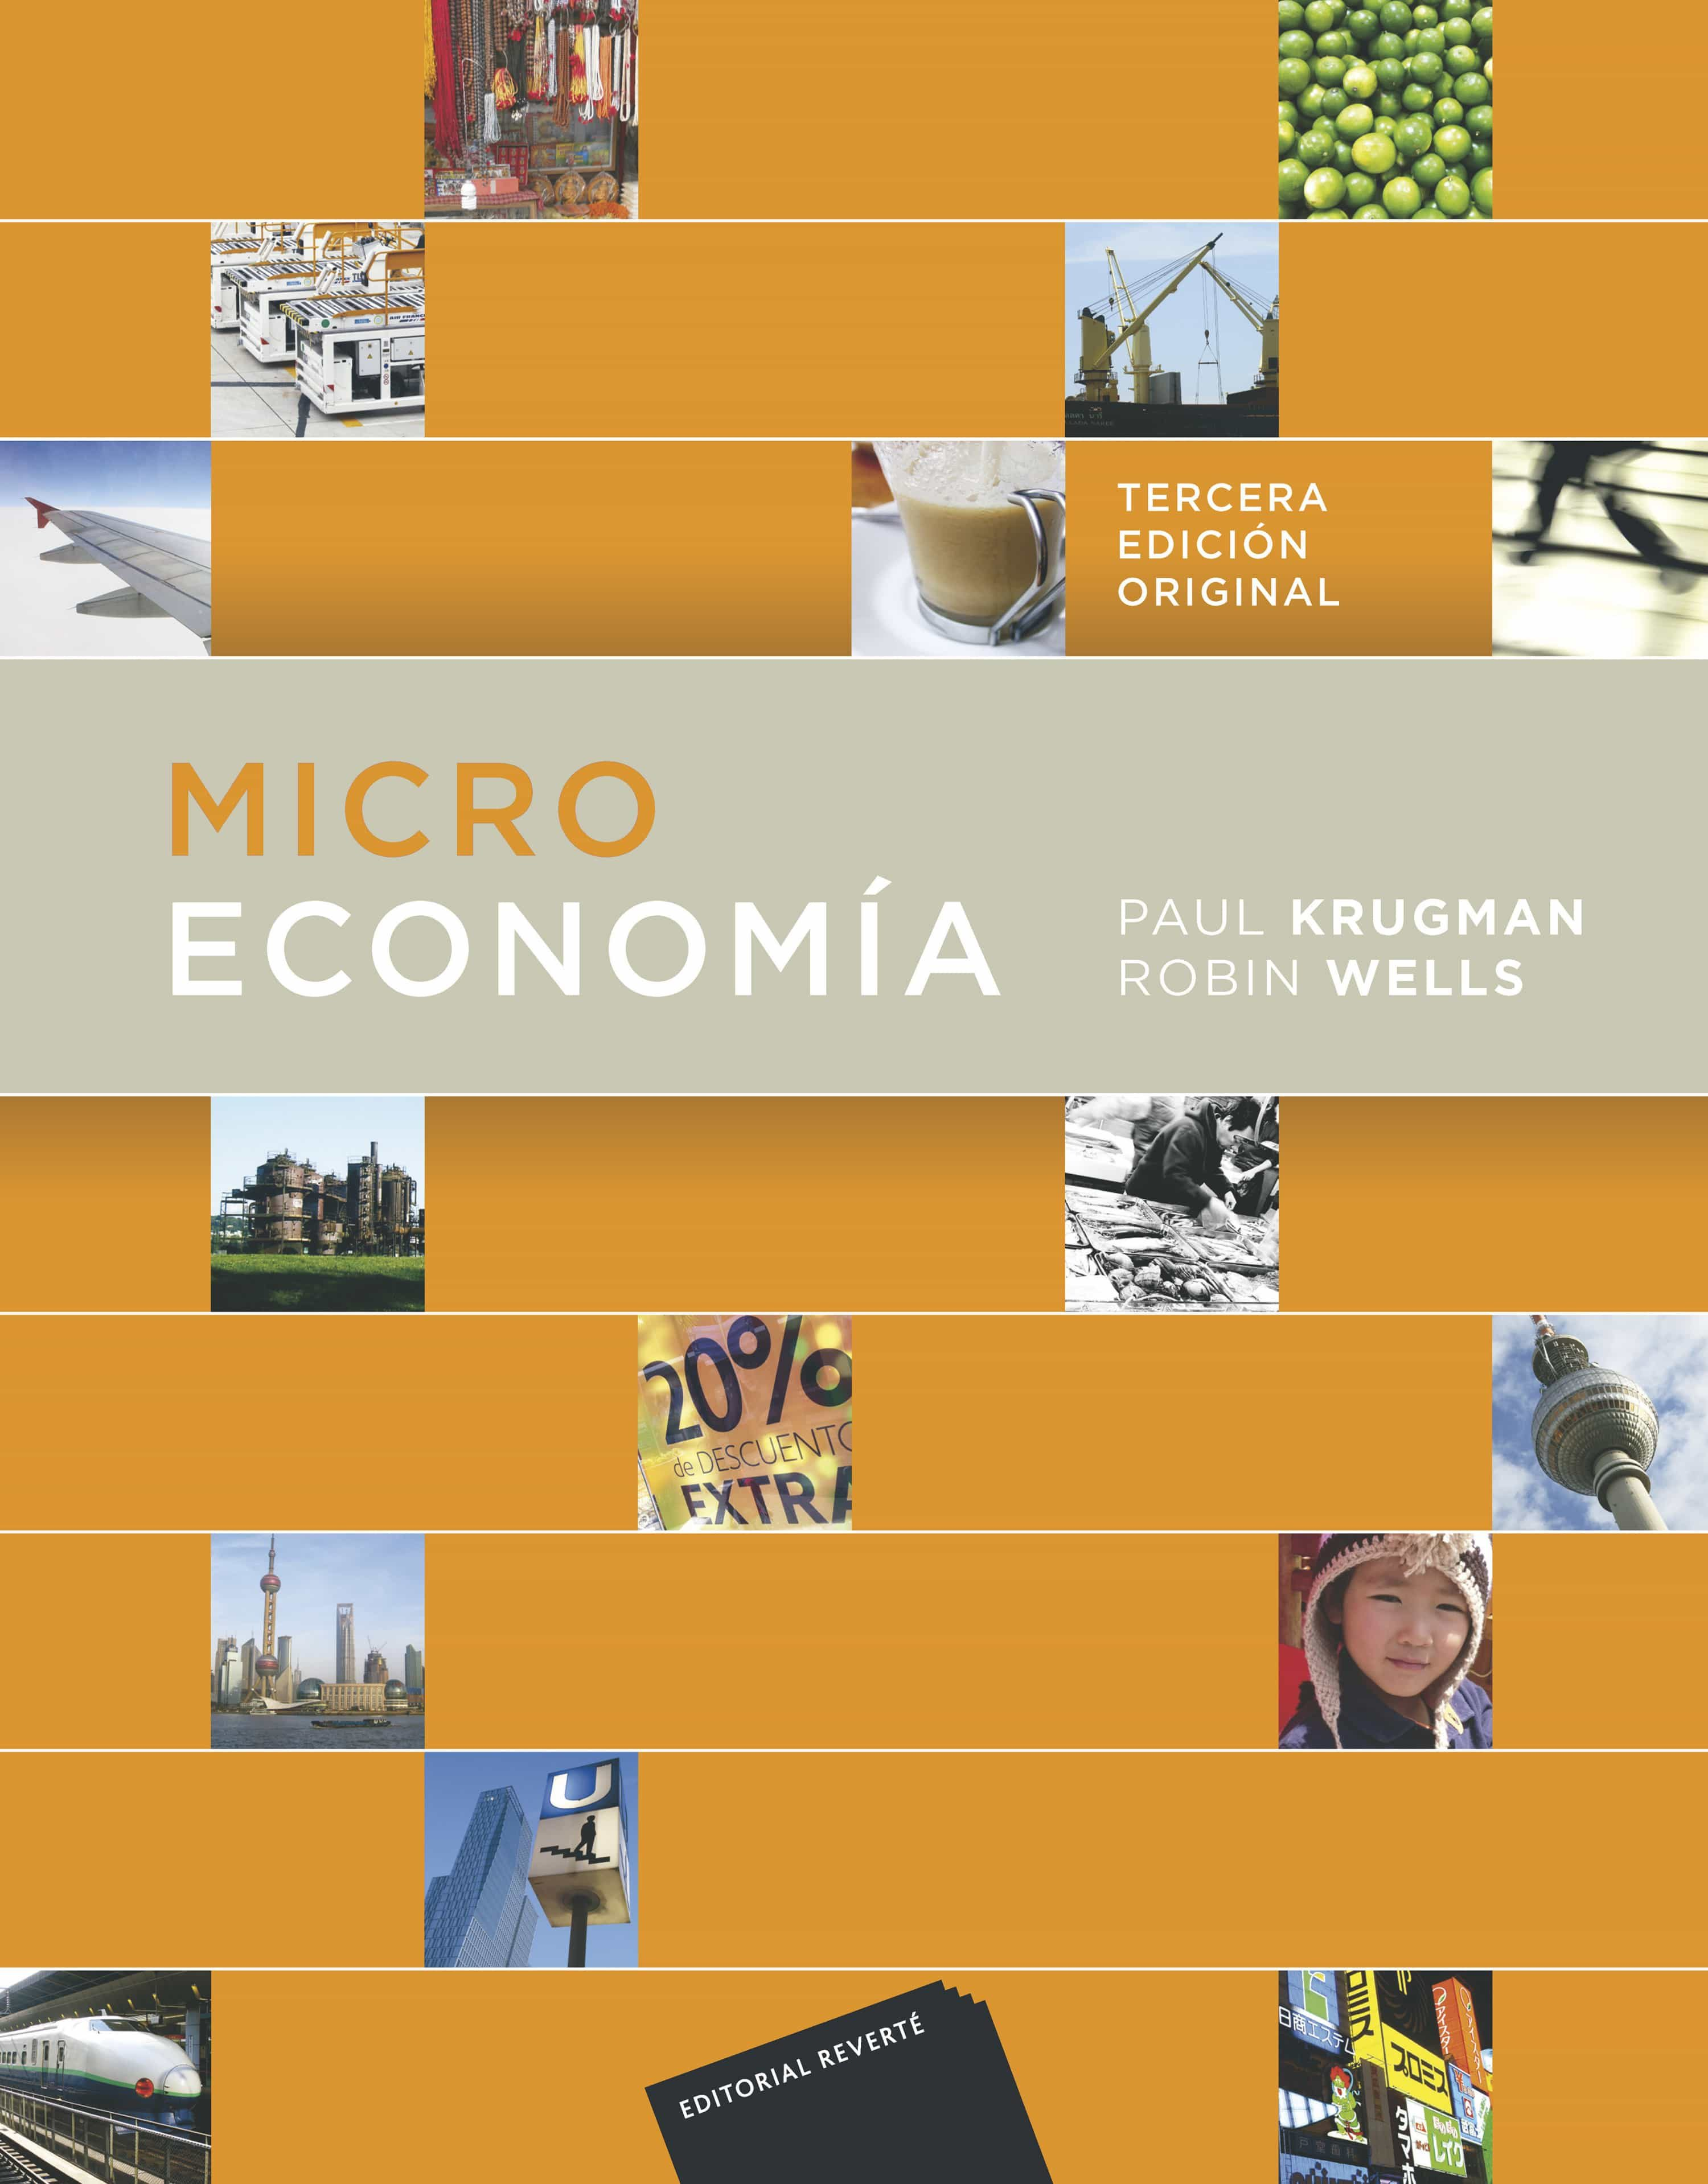 Microeconomia 2 ed paul krugman robin wells 9788429126037